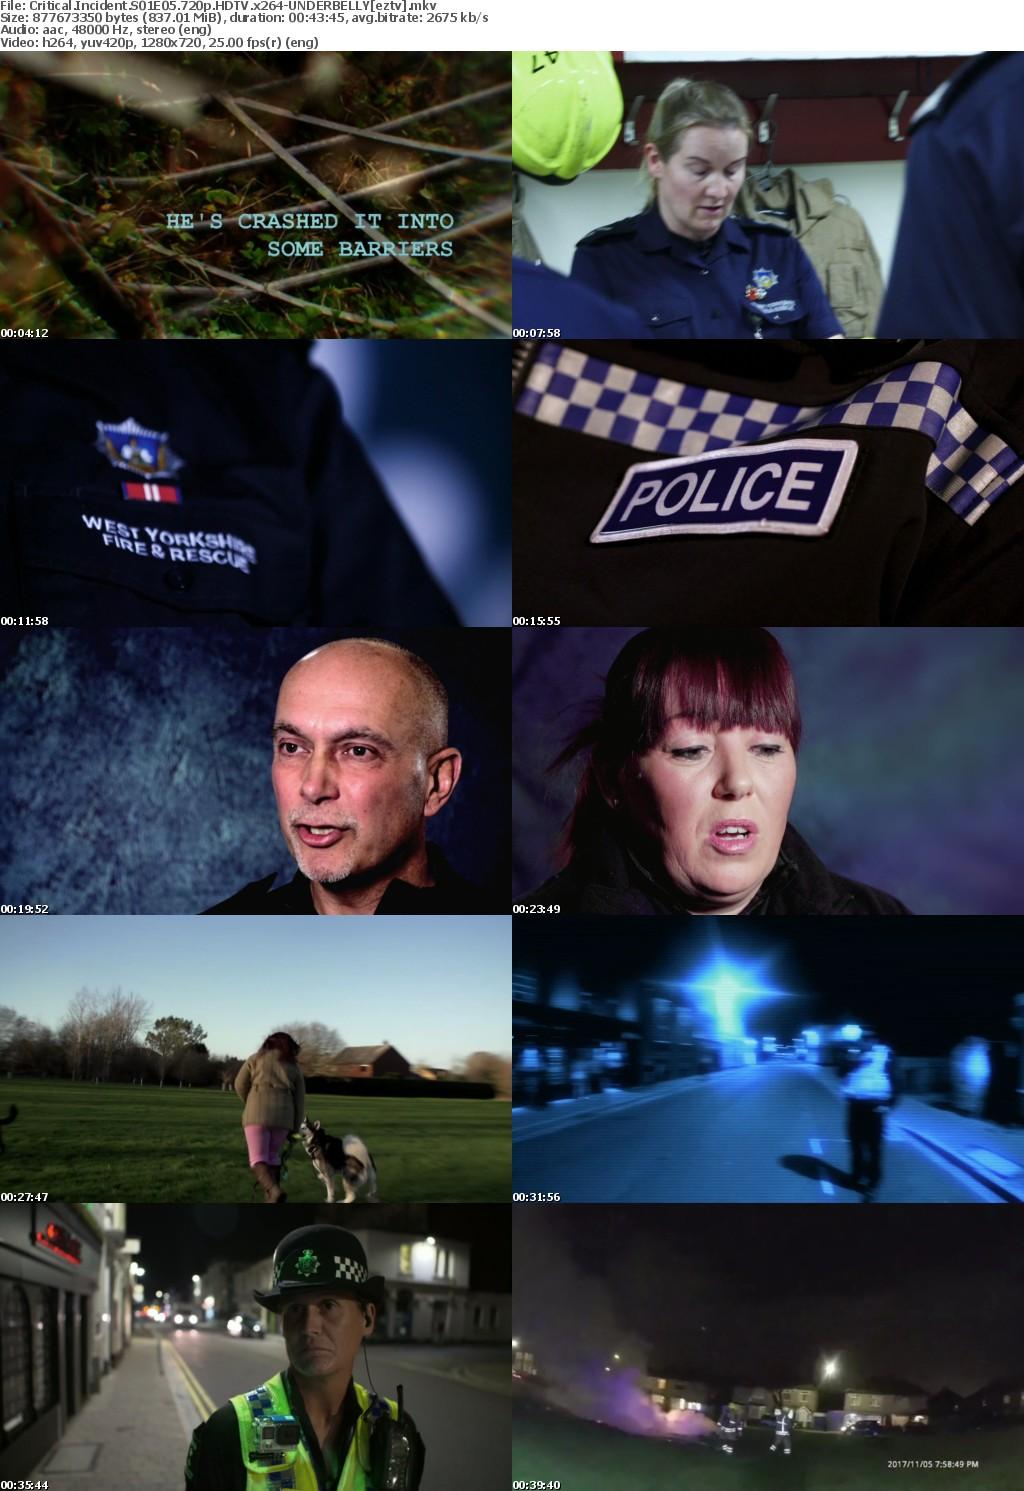 Critical Incident S01E05 720p HDTV x264-UNDERBELLY